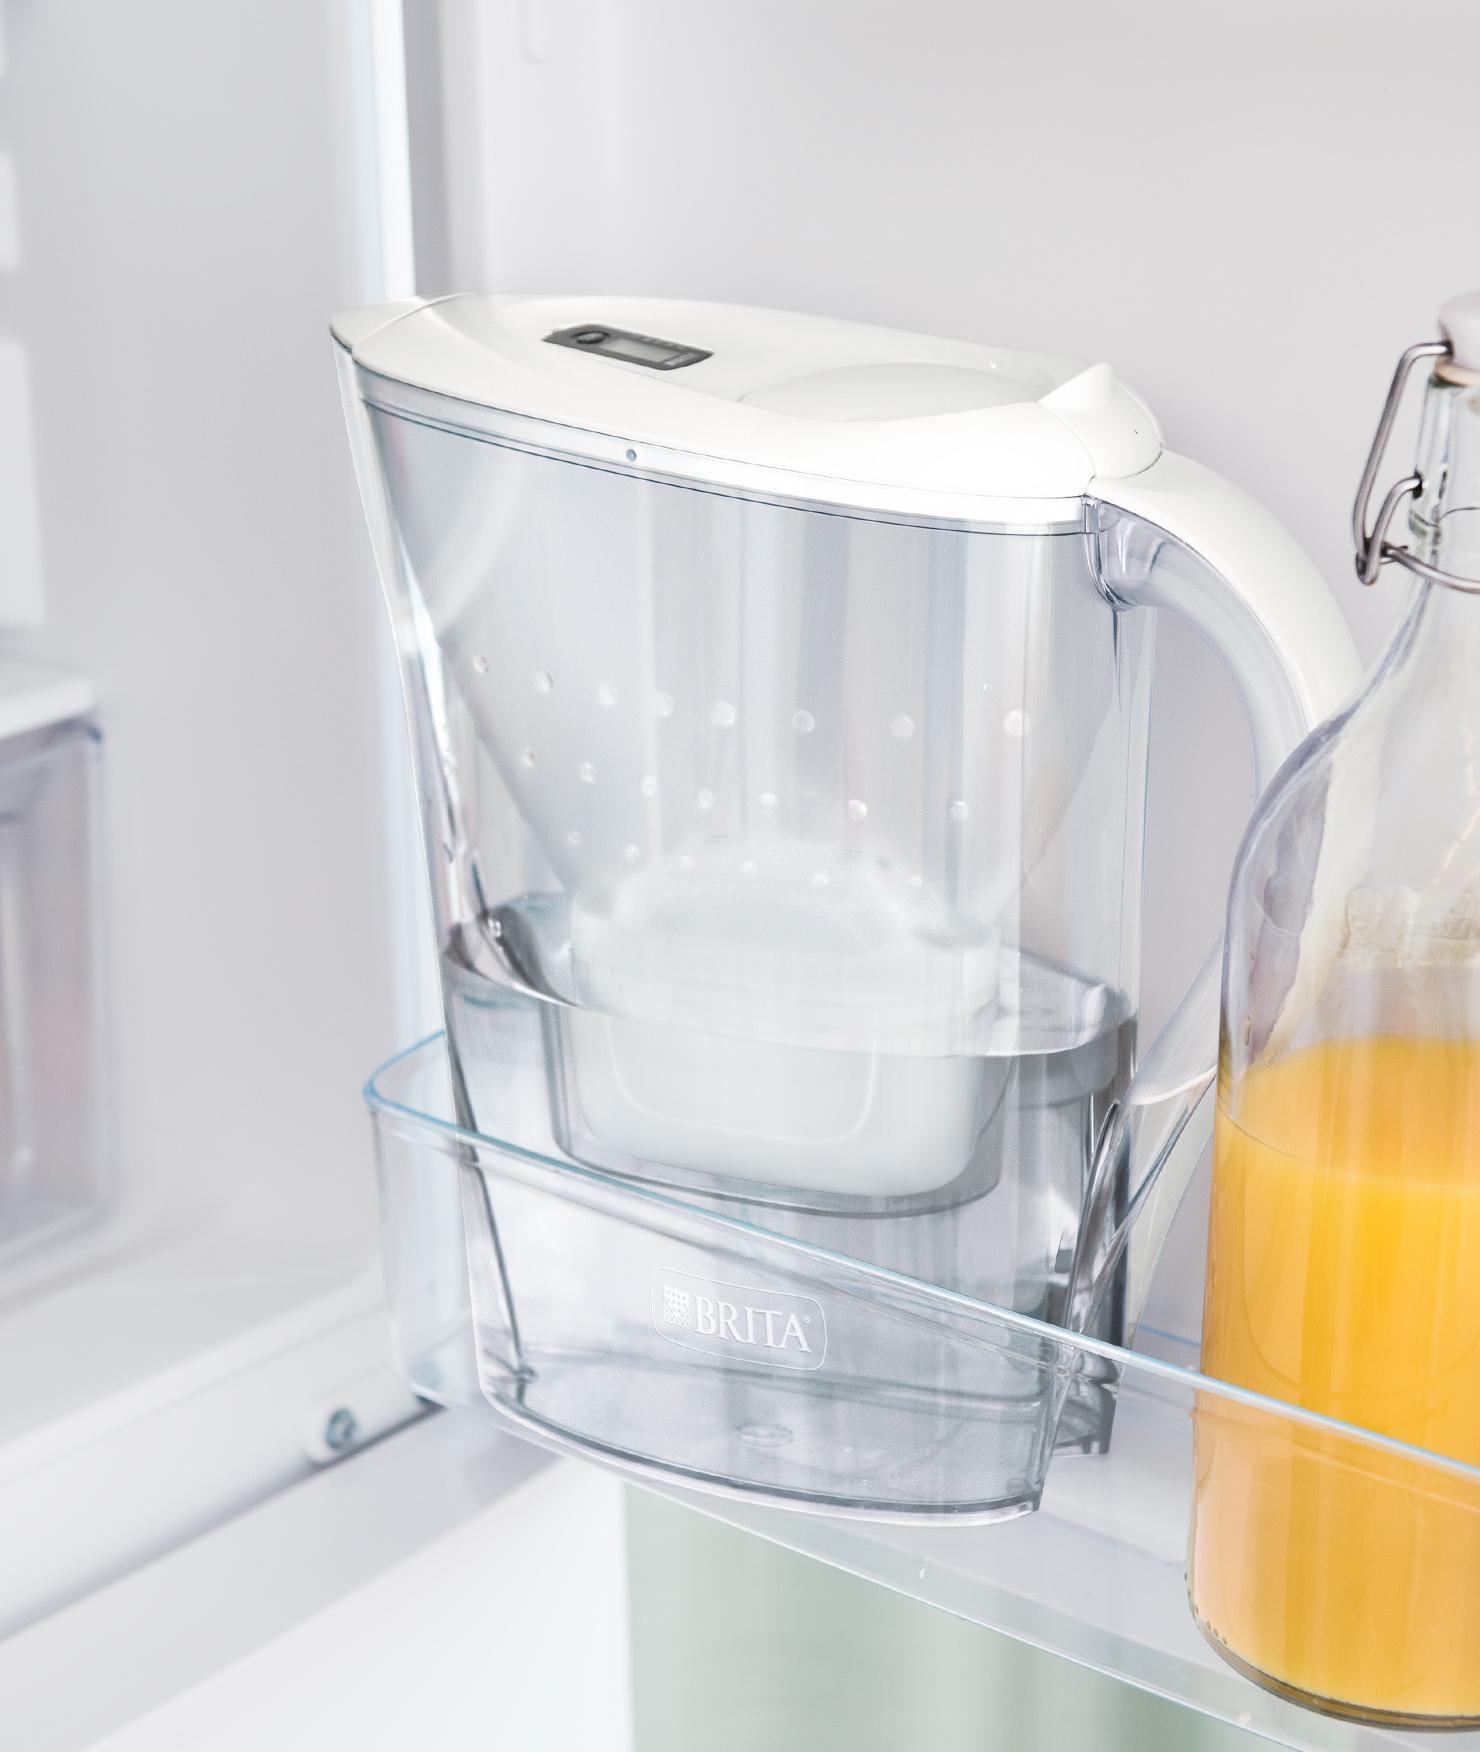 BRITA fill&enjoy Marella Cool white fridge door